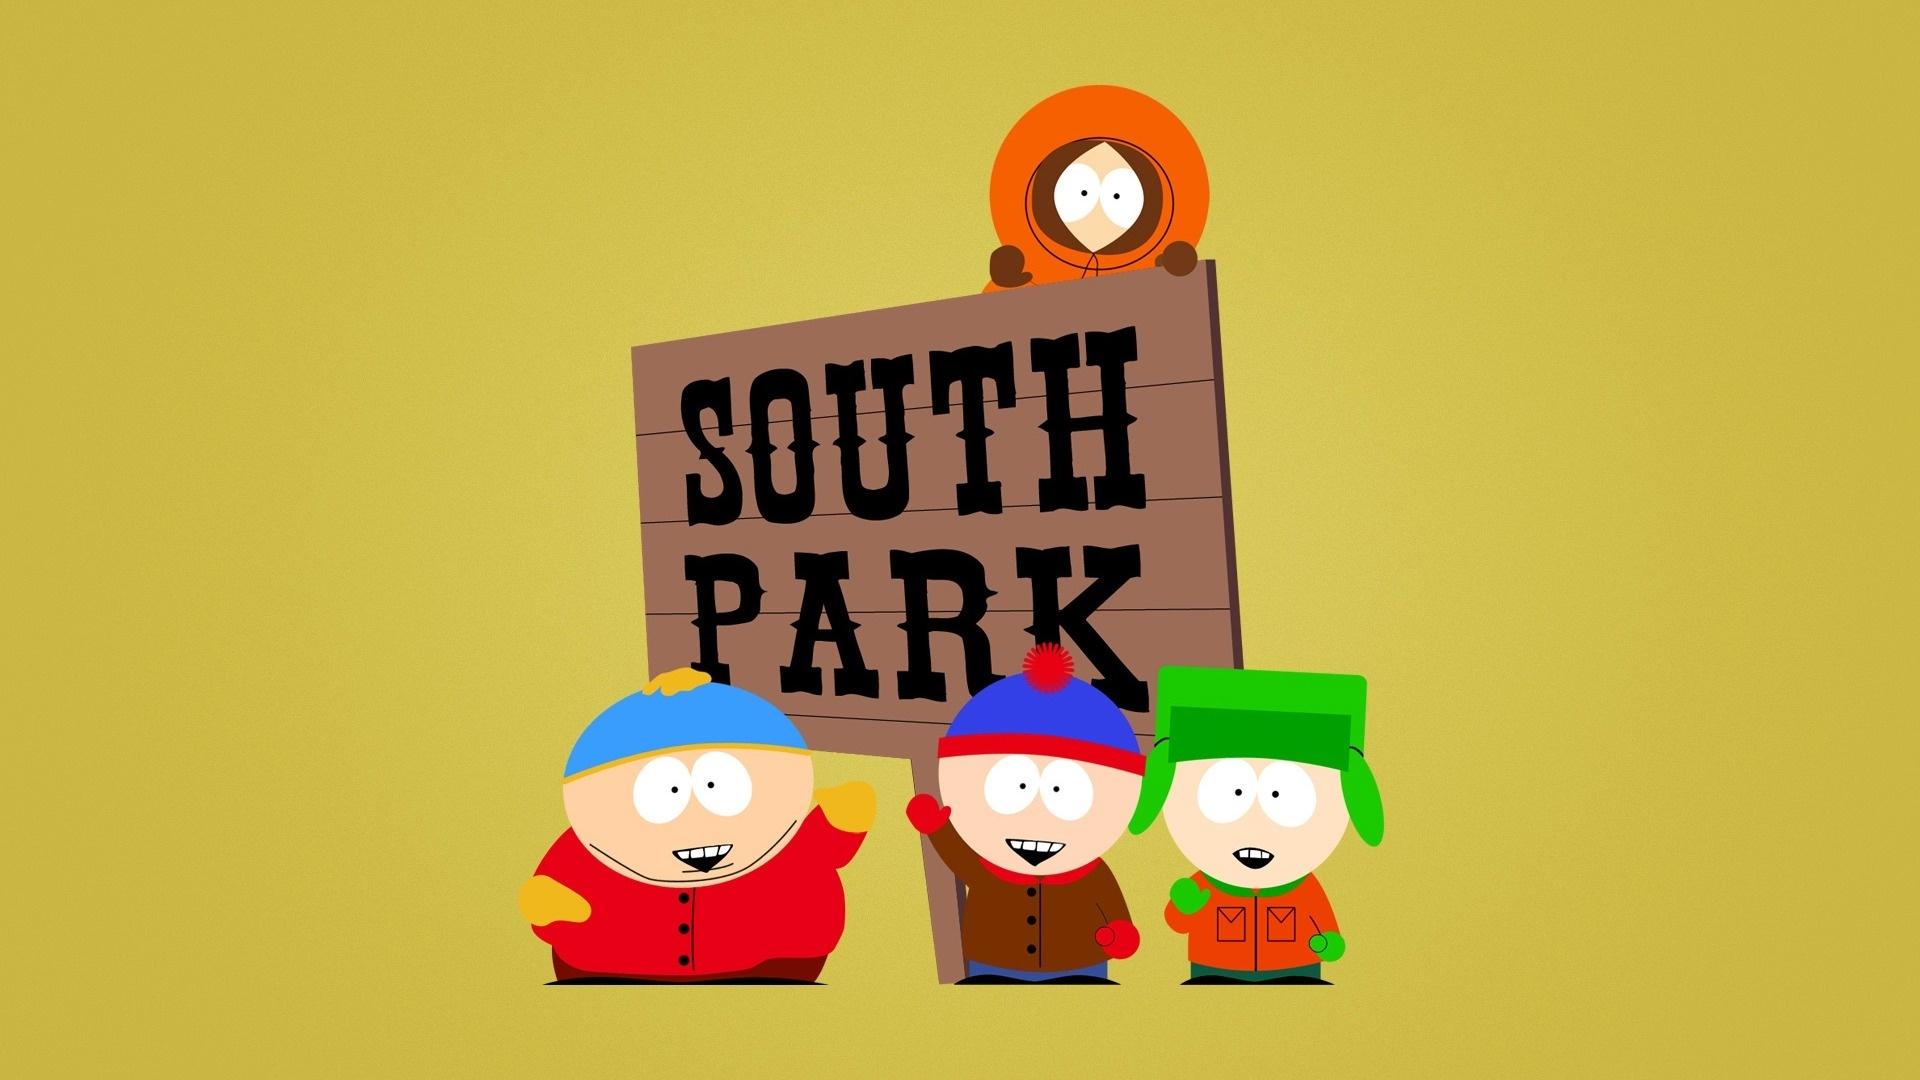 South Park free wallpaper